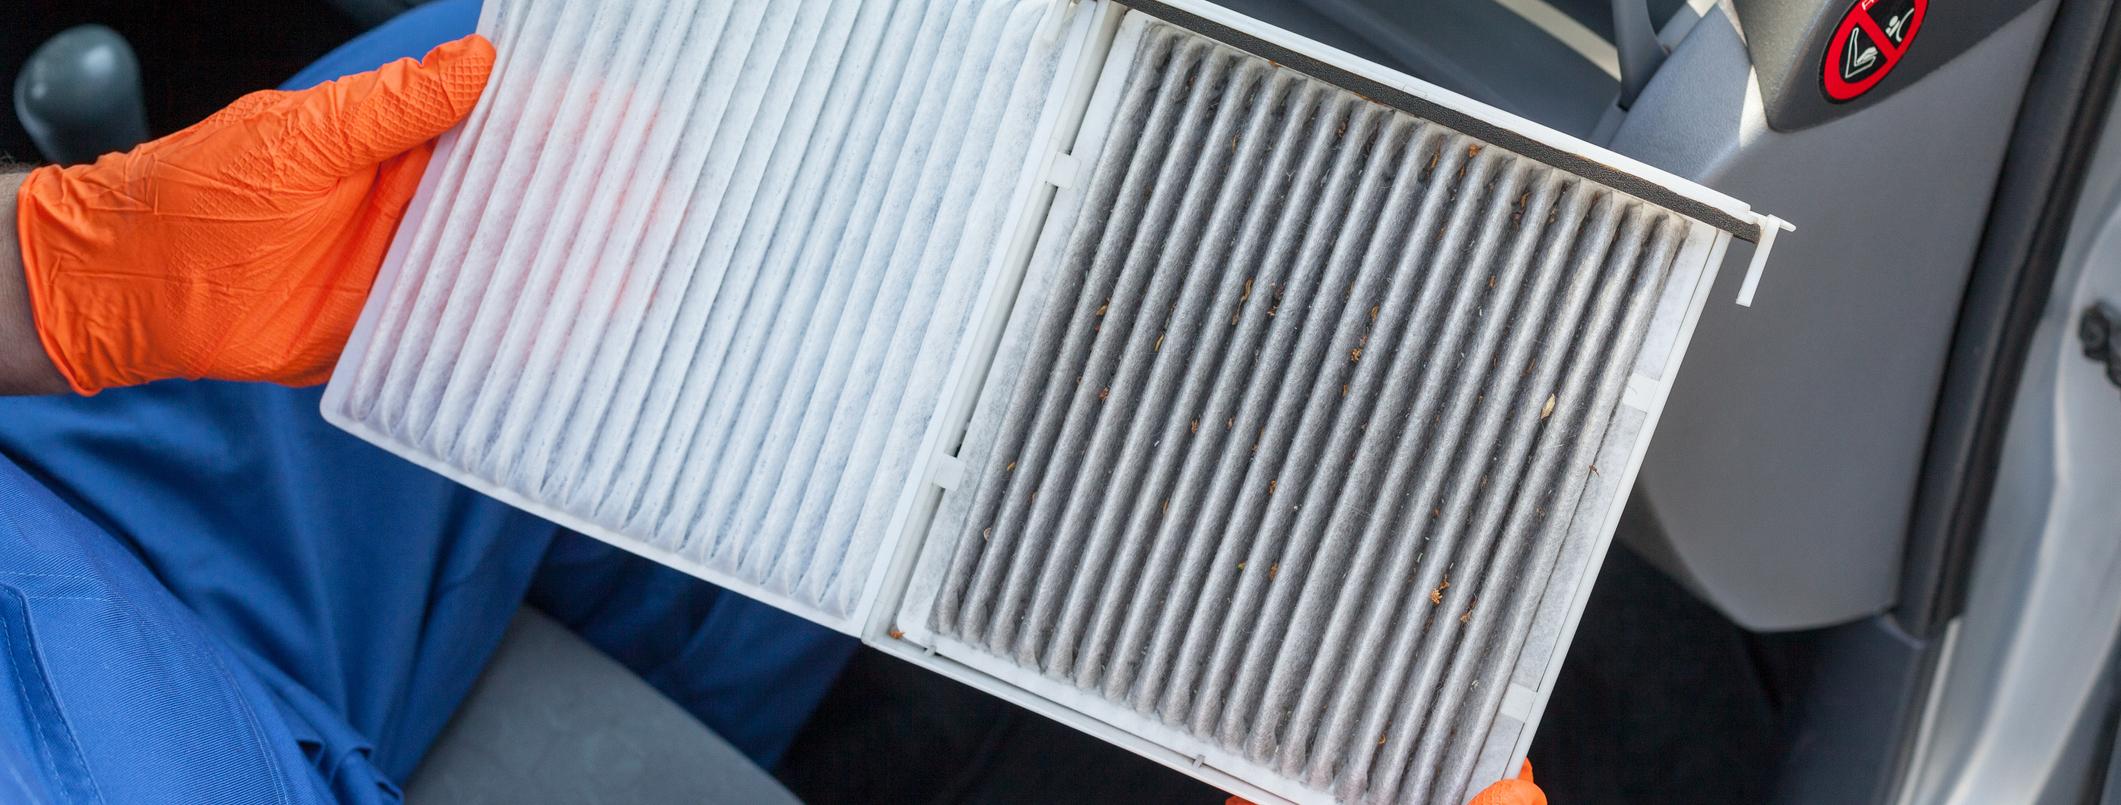 Cabin Air Filter Replacement near Falls Church, VA